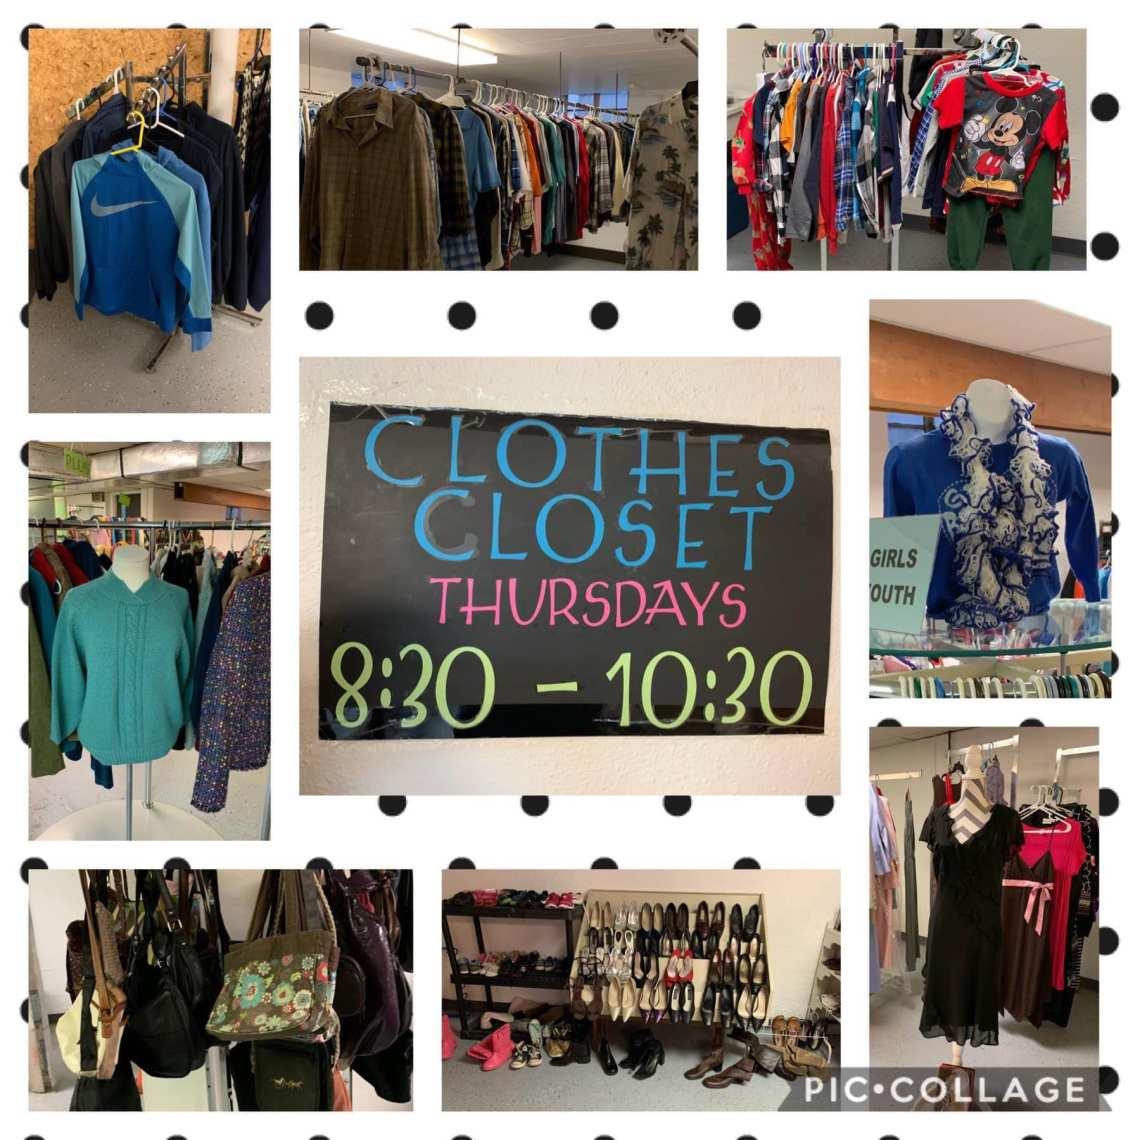 Clothing Room/Closet